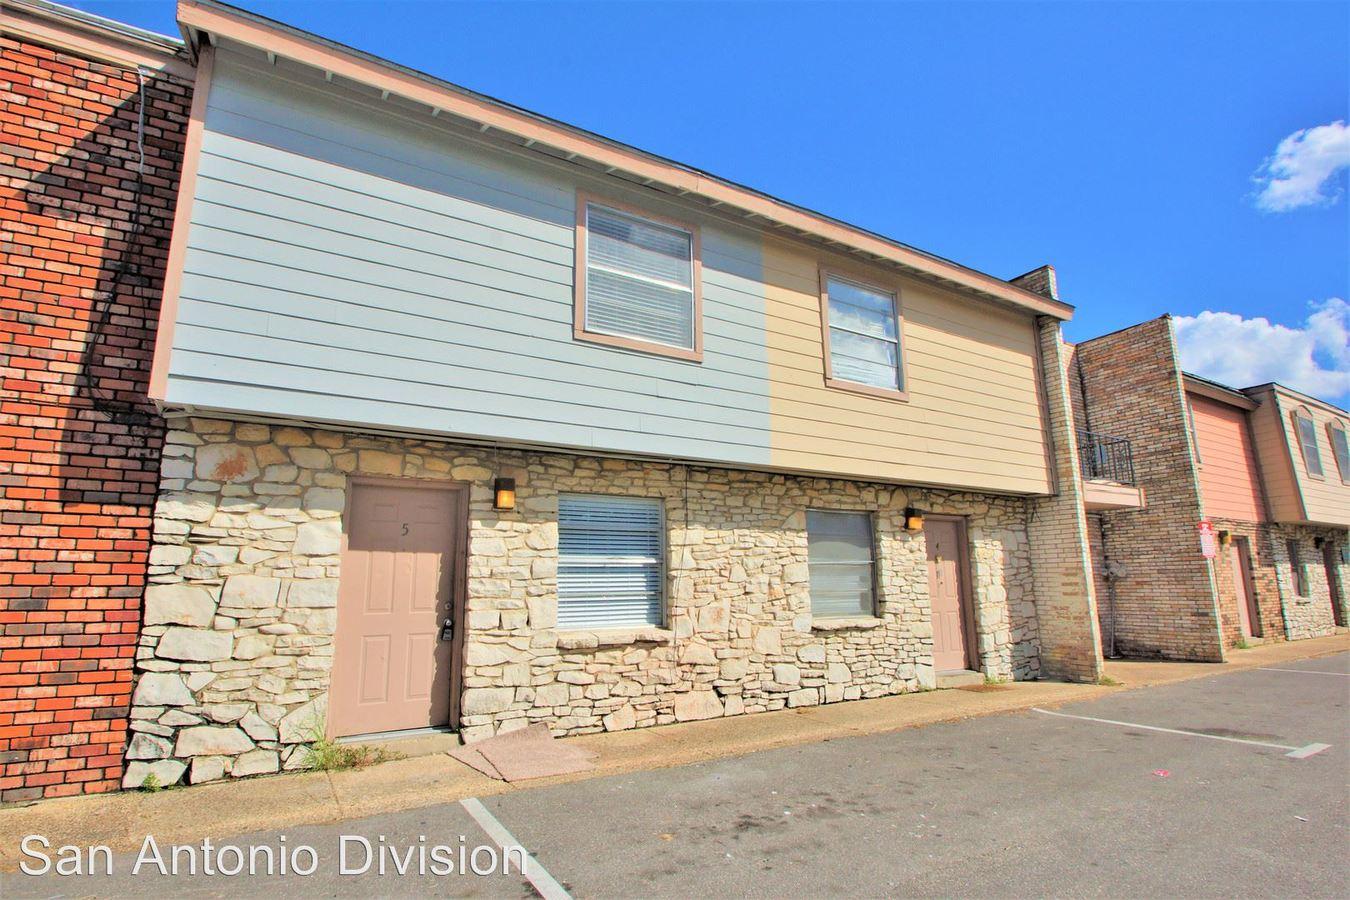 1 Bedroom 1 Bathroom Apartment for rent at 9526 Contessa Dr. in San Antonio, TX